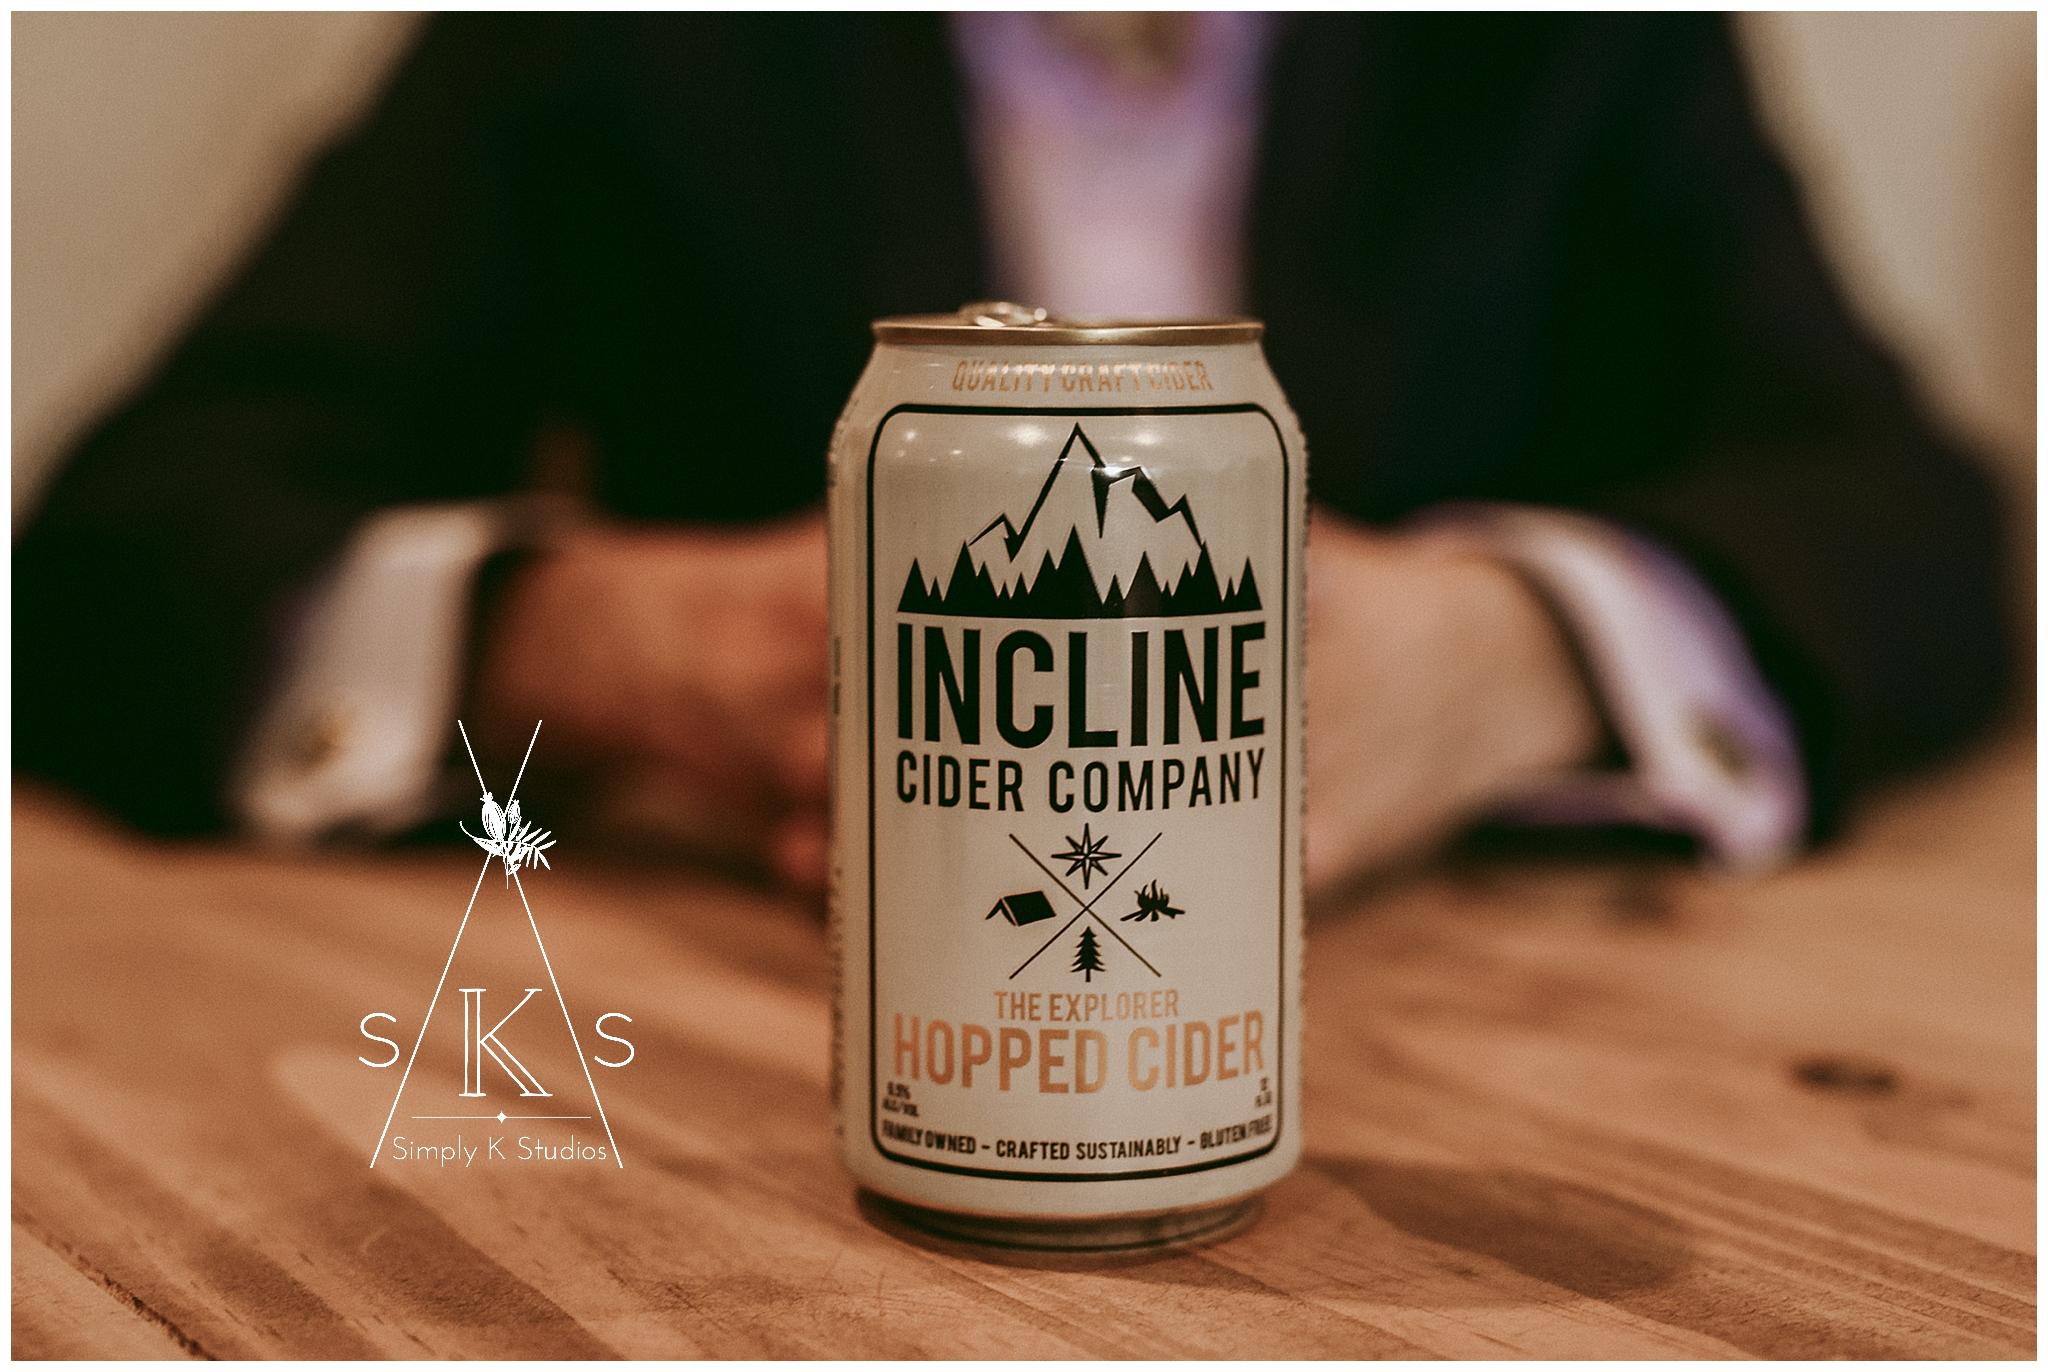 20 Incline Cider Company.jpg